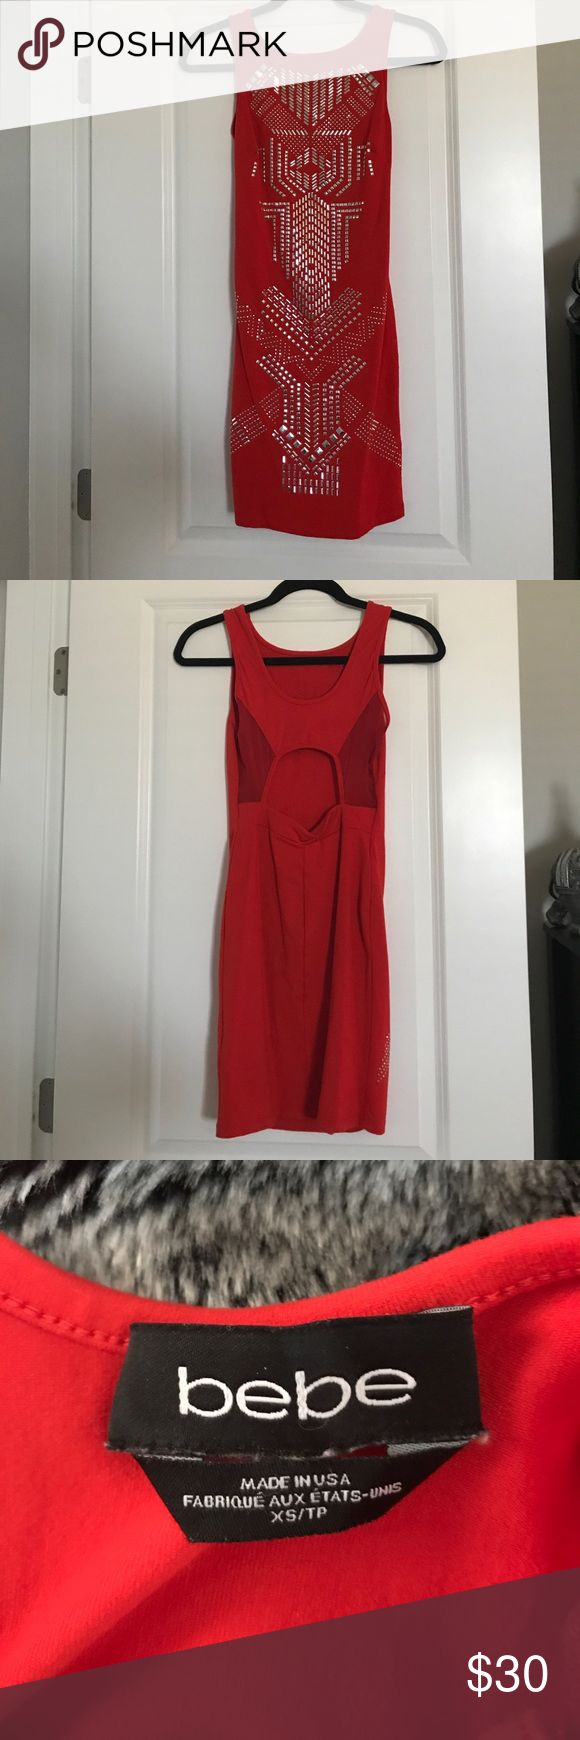 Bebe Mini Dress! EUC Sz. Xs Red and silver Mini Dress! Hardly Worn! bebe Dresses Mini